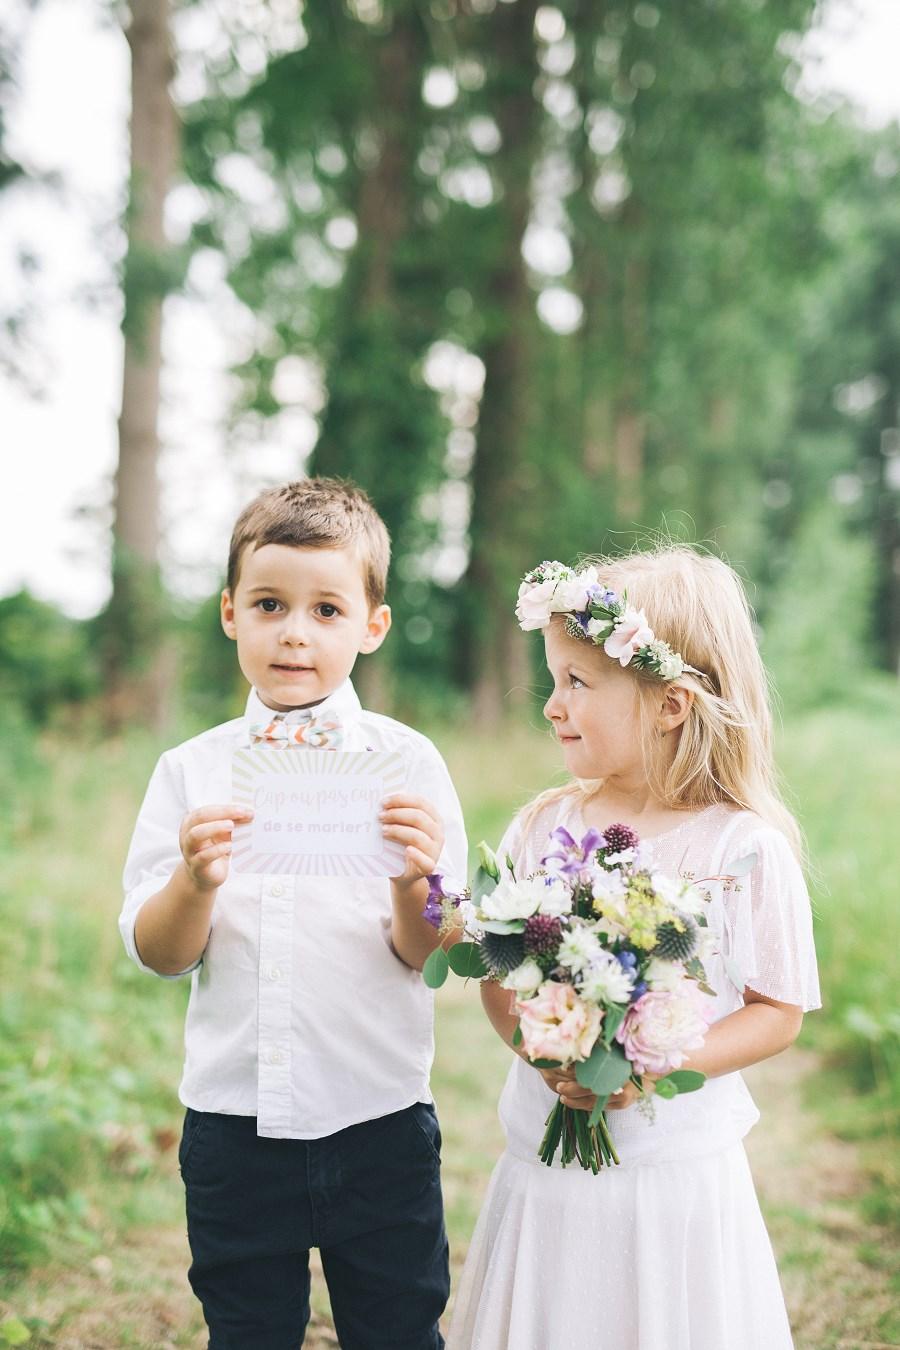 Lovetralala_shooting d'inspiration kiss the bride_16